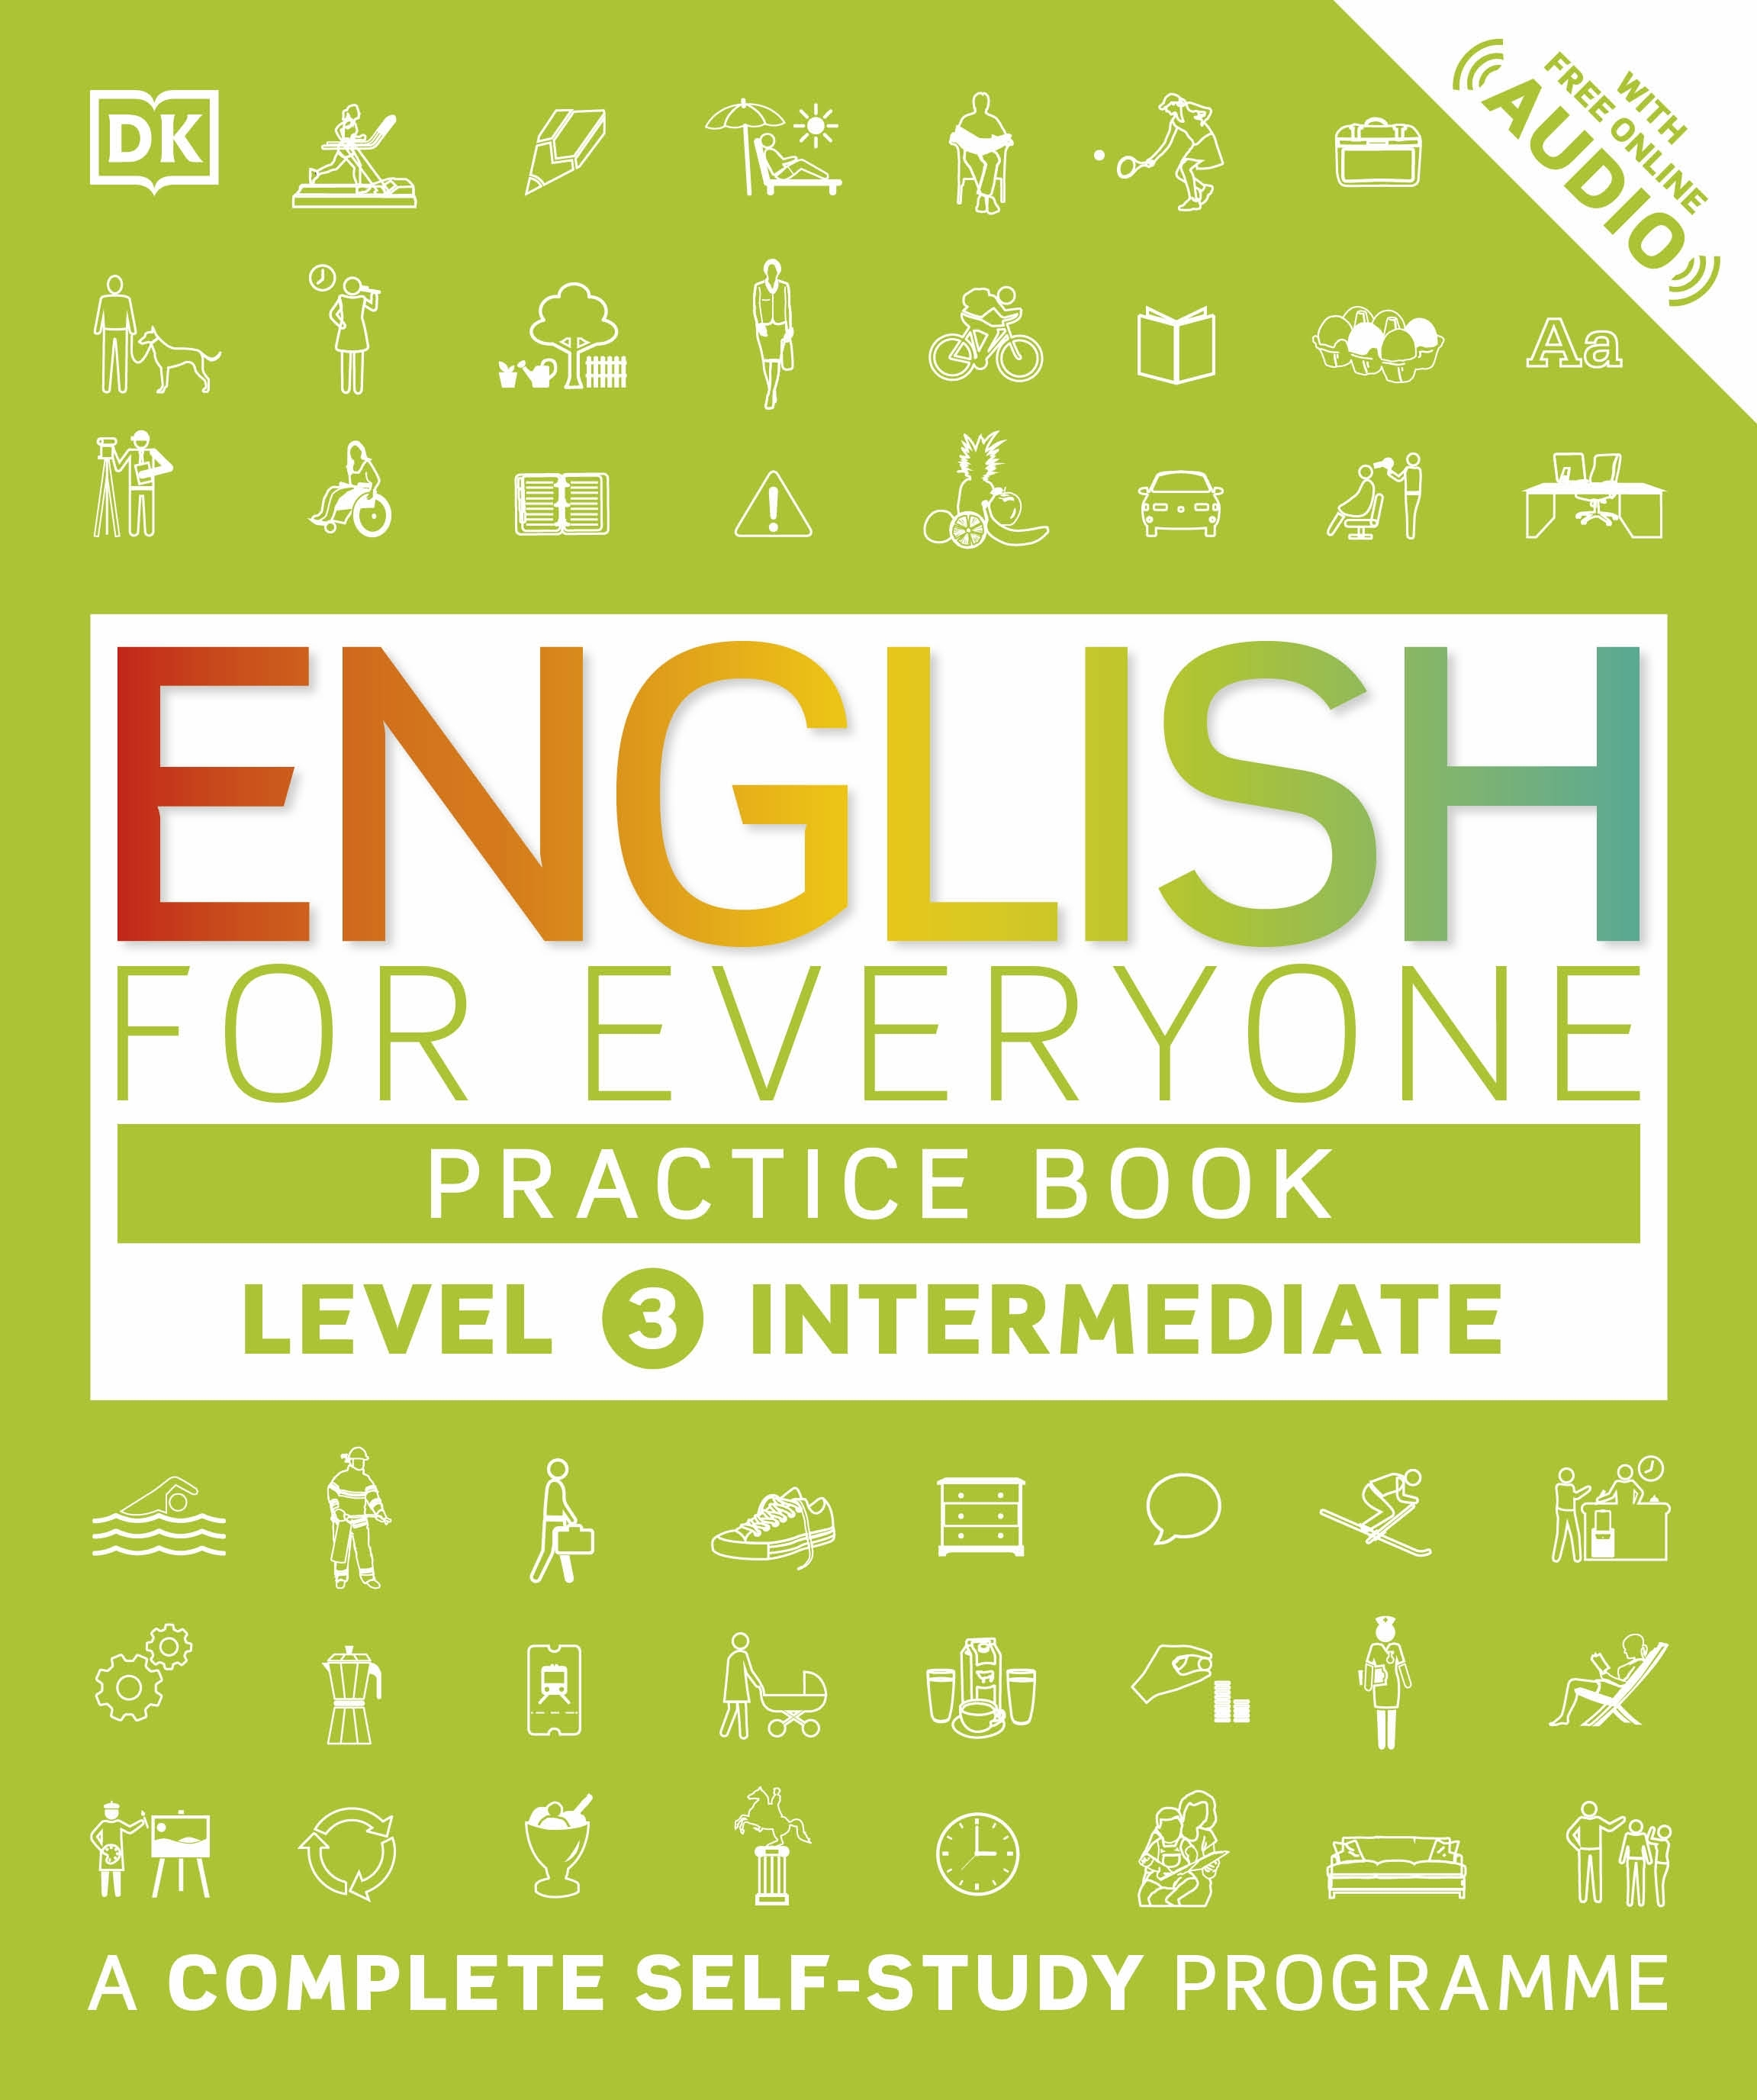 dk english for everyone pdf